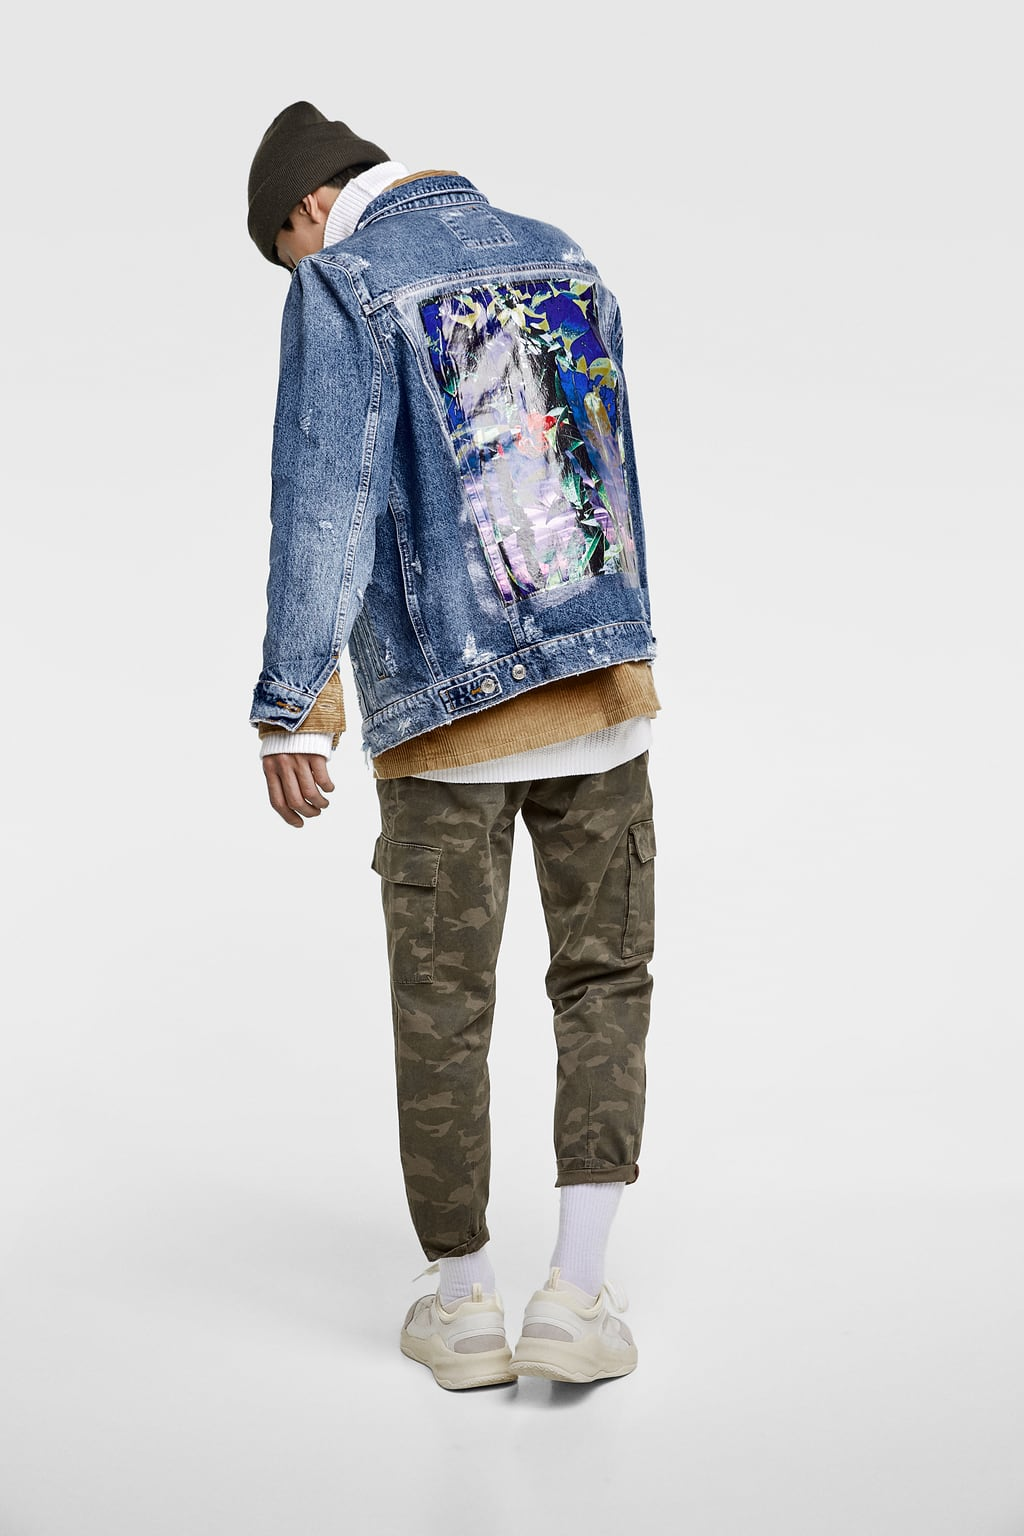 Men S Denim Jackets New Collection Online Zara Colombia Printed Denim Denim Jacket Men Denim Jacket [ 1536 x 1024 Pixel ]